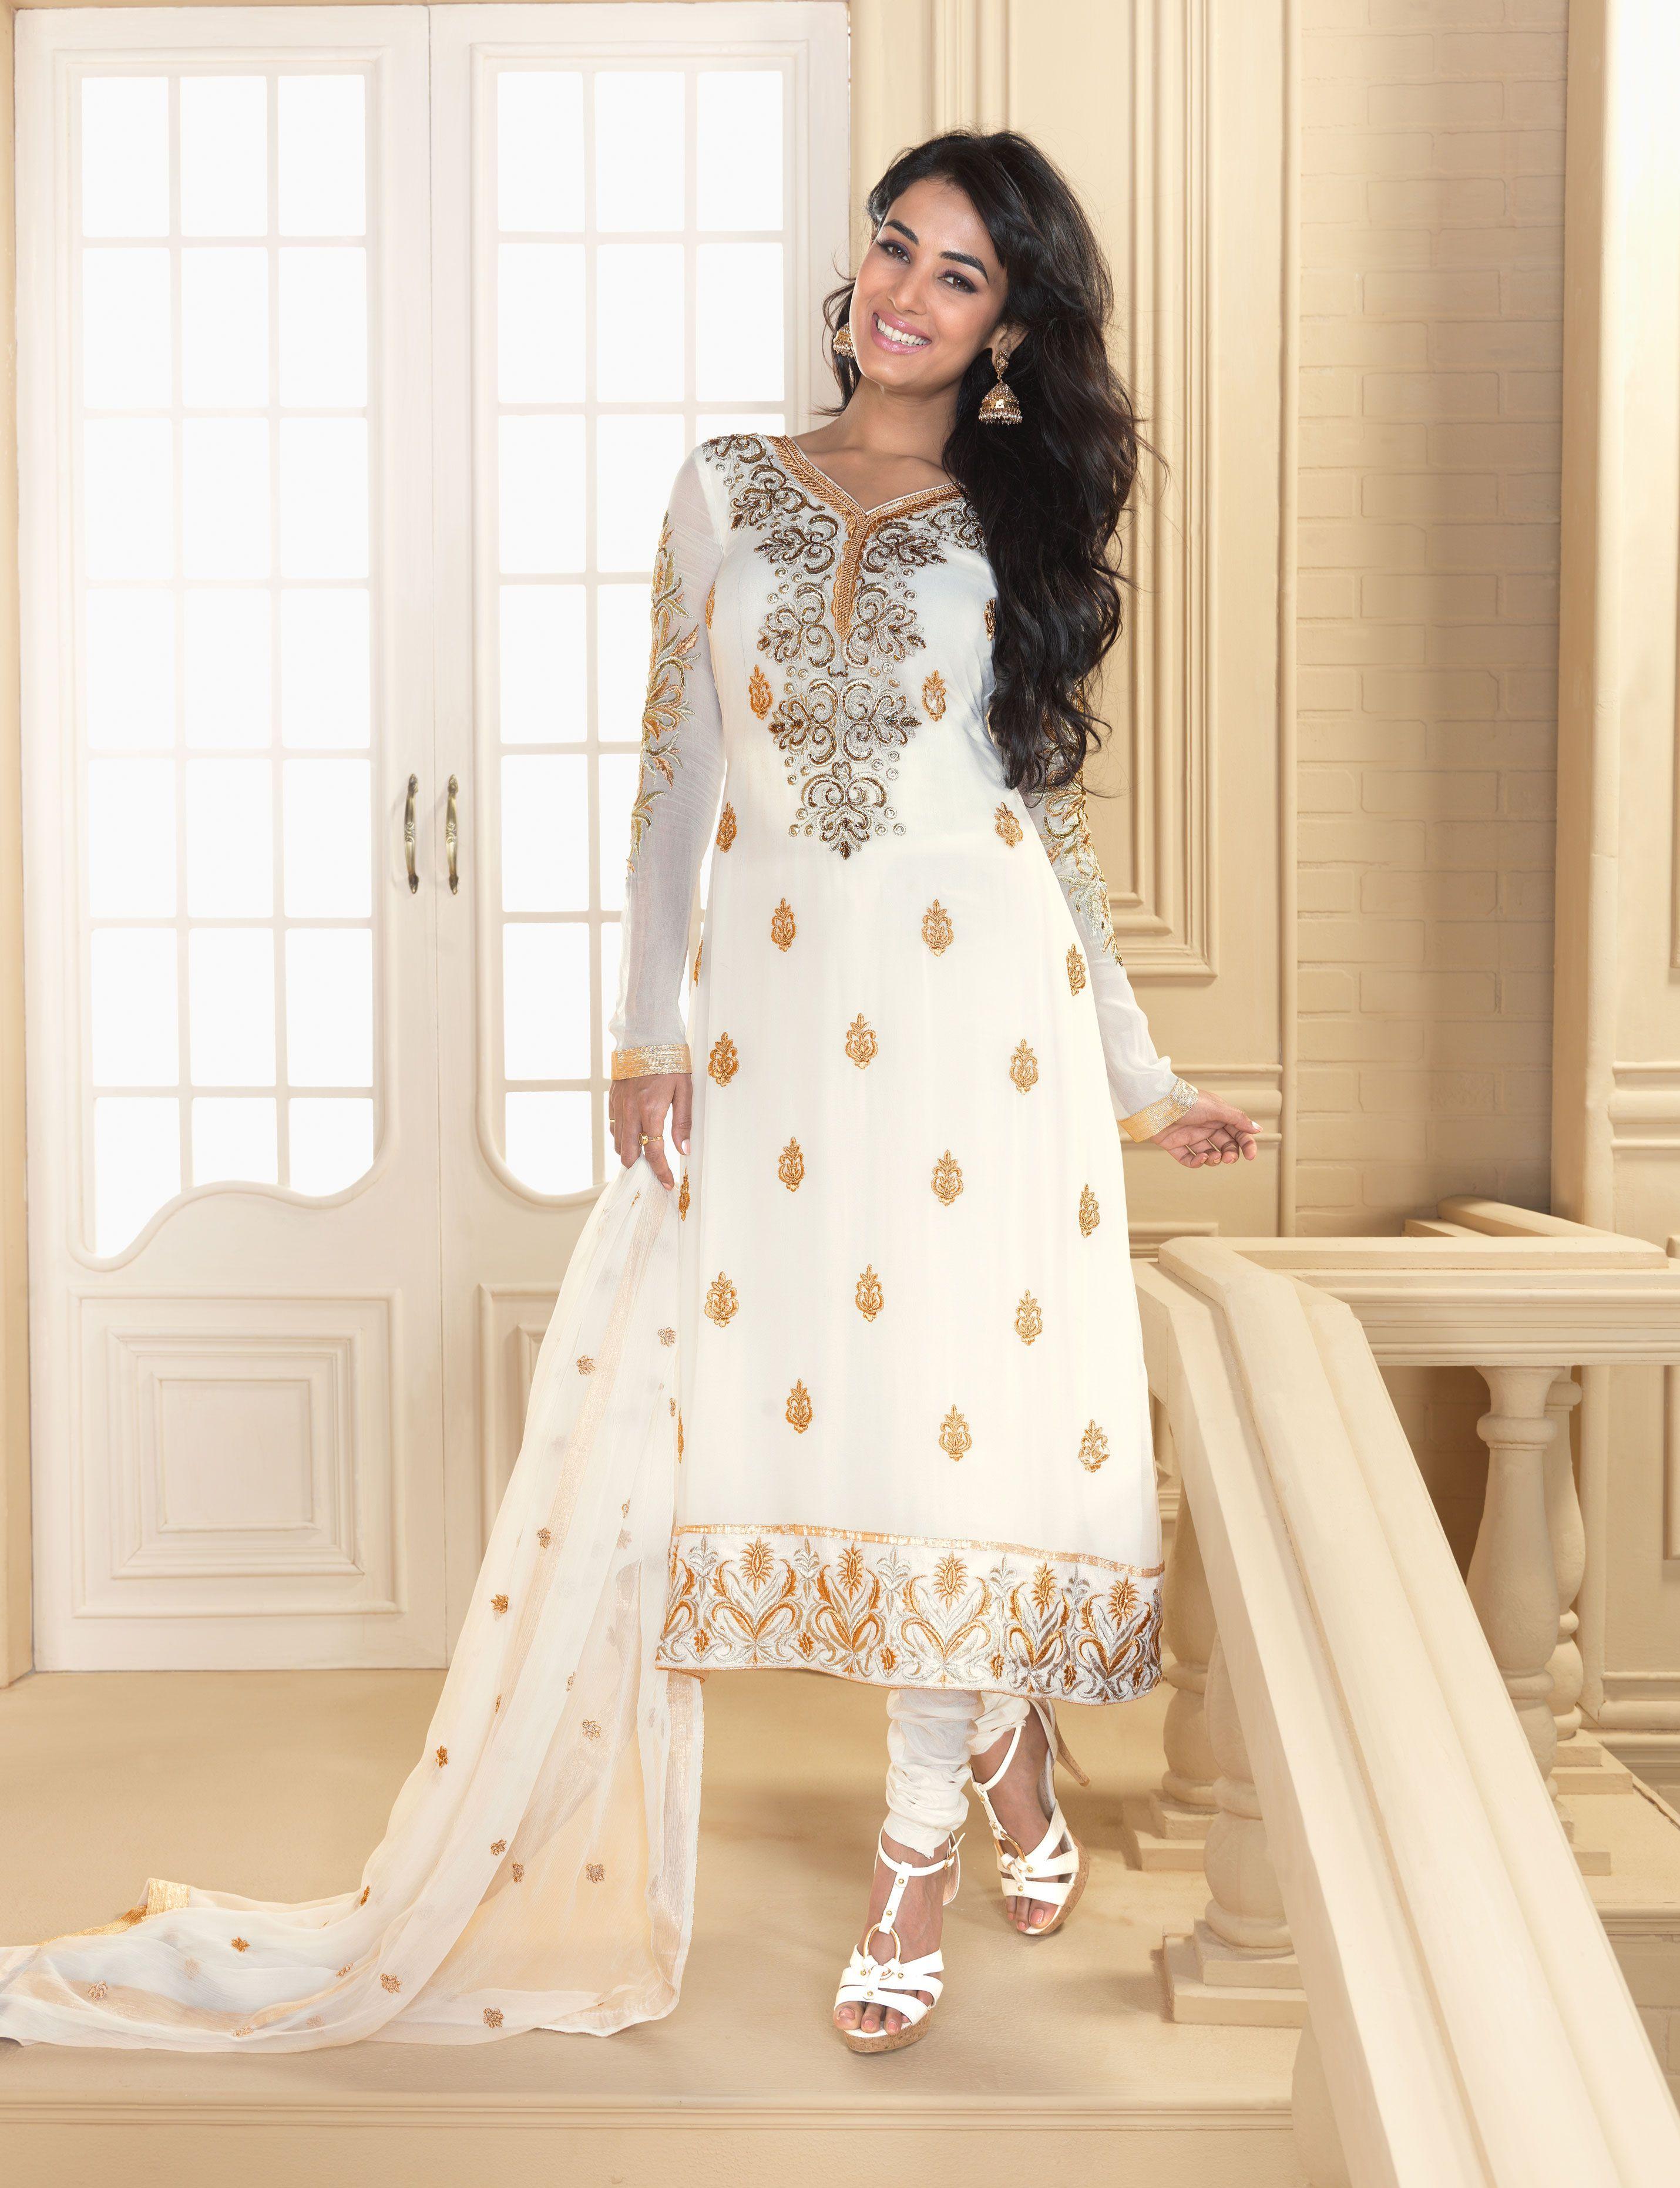 09507623a5 White and gold salwar   What We'll Wear...   Wedding salwar kameez ...